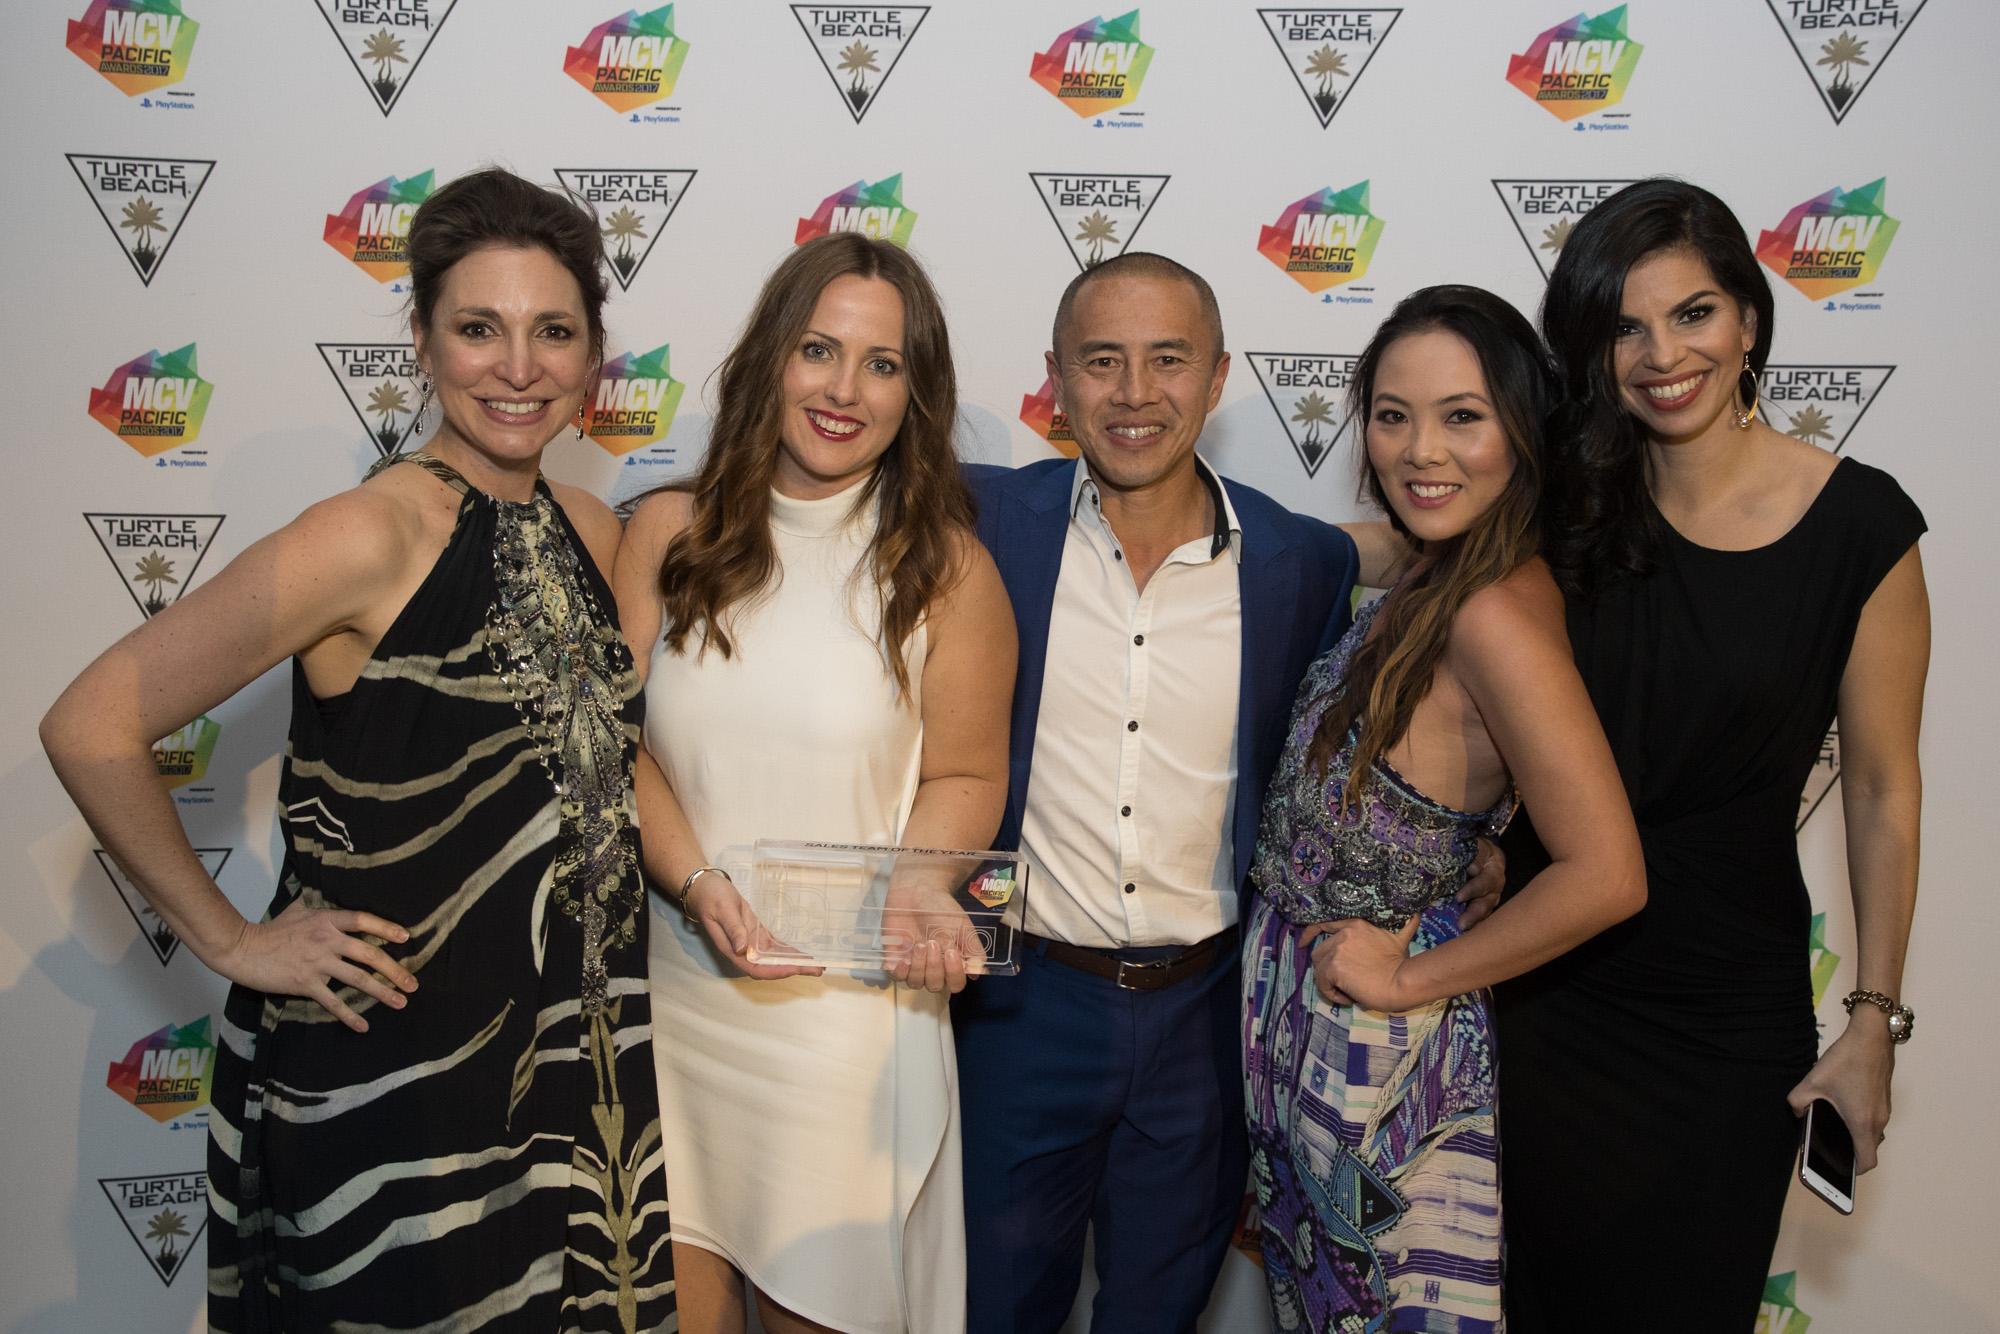 MCV_Pacific_Awards_1_June_17_PS_091.jpg